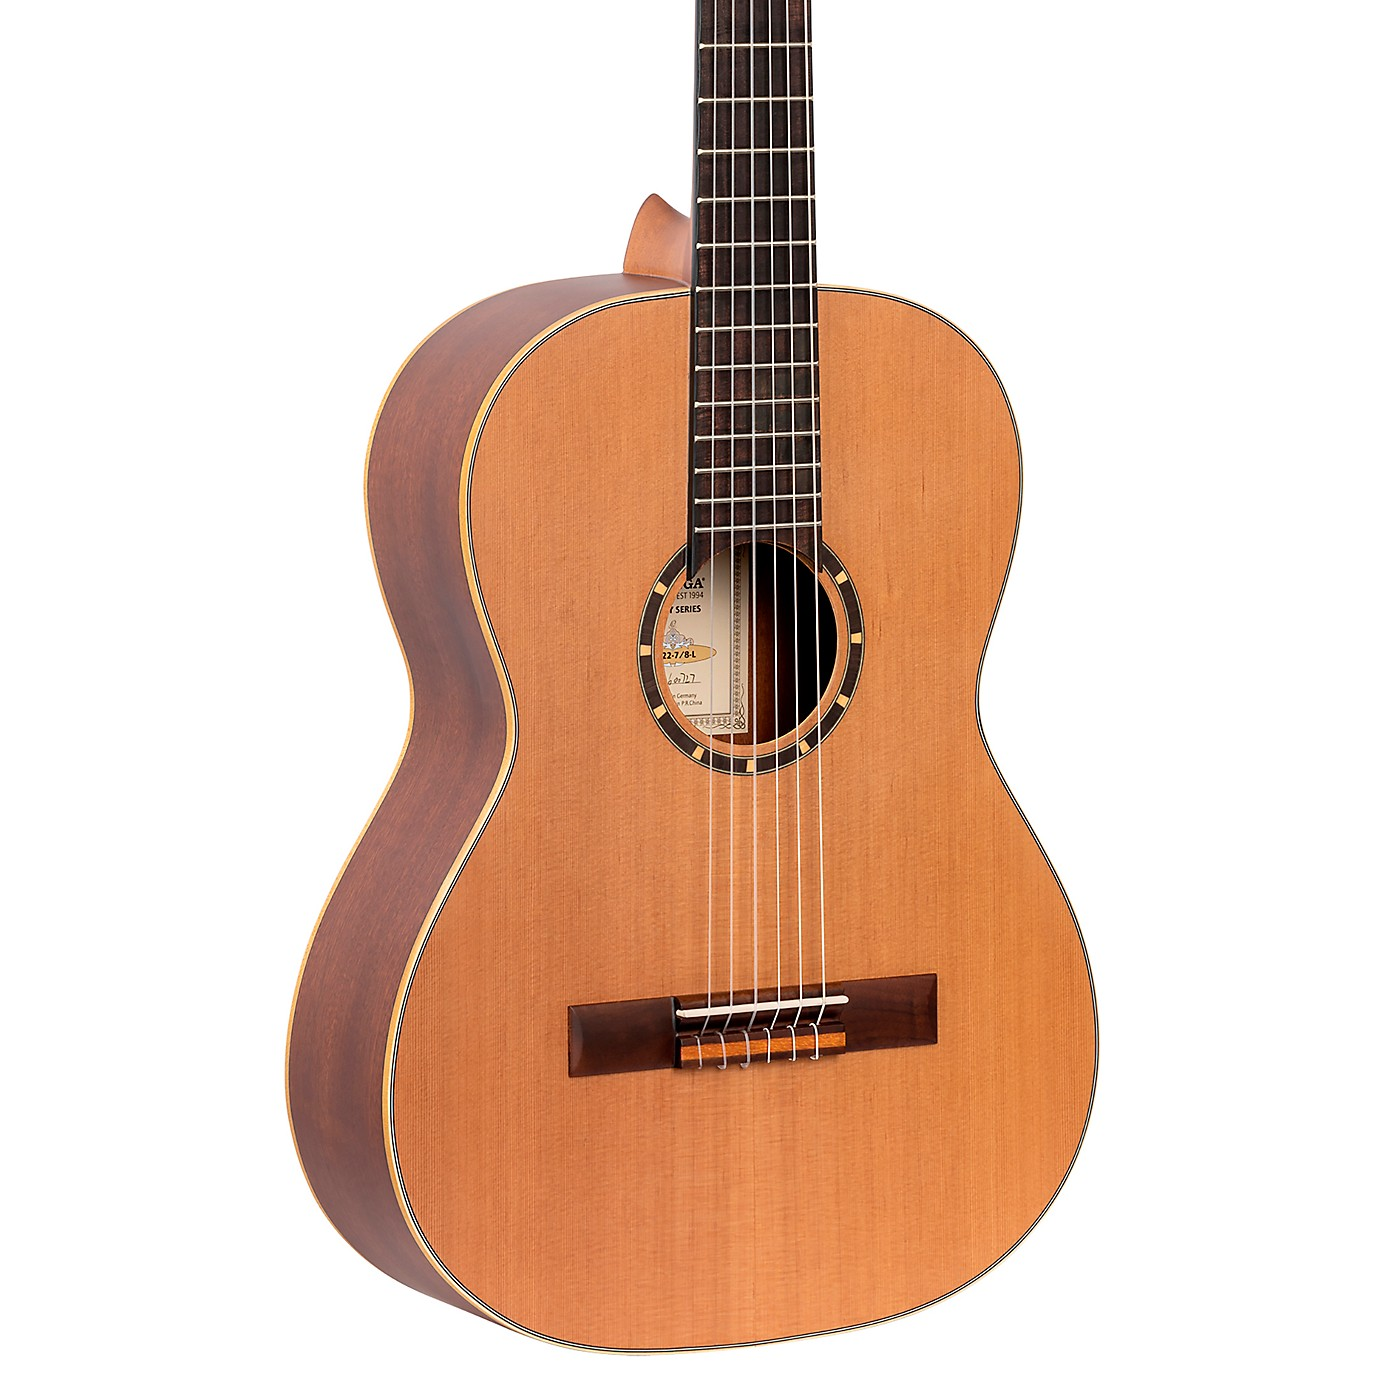 Ortega Family Series R122-7/8-L 7/8 Size Classical Guitar thumbnail